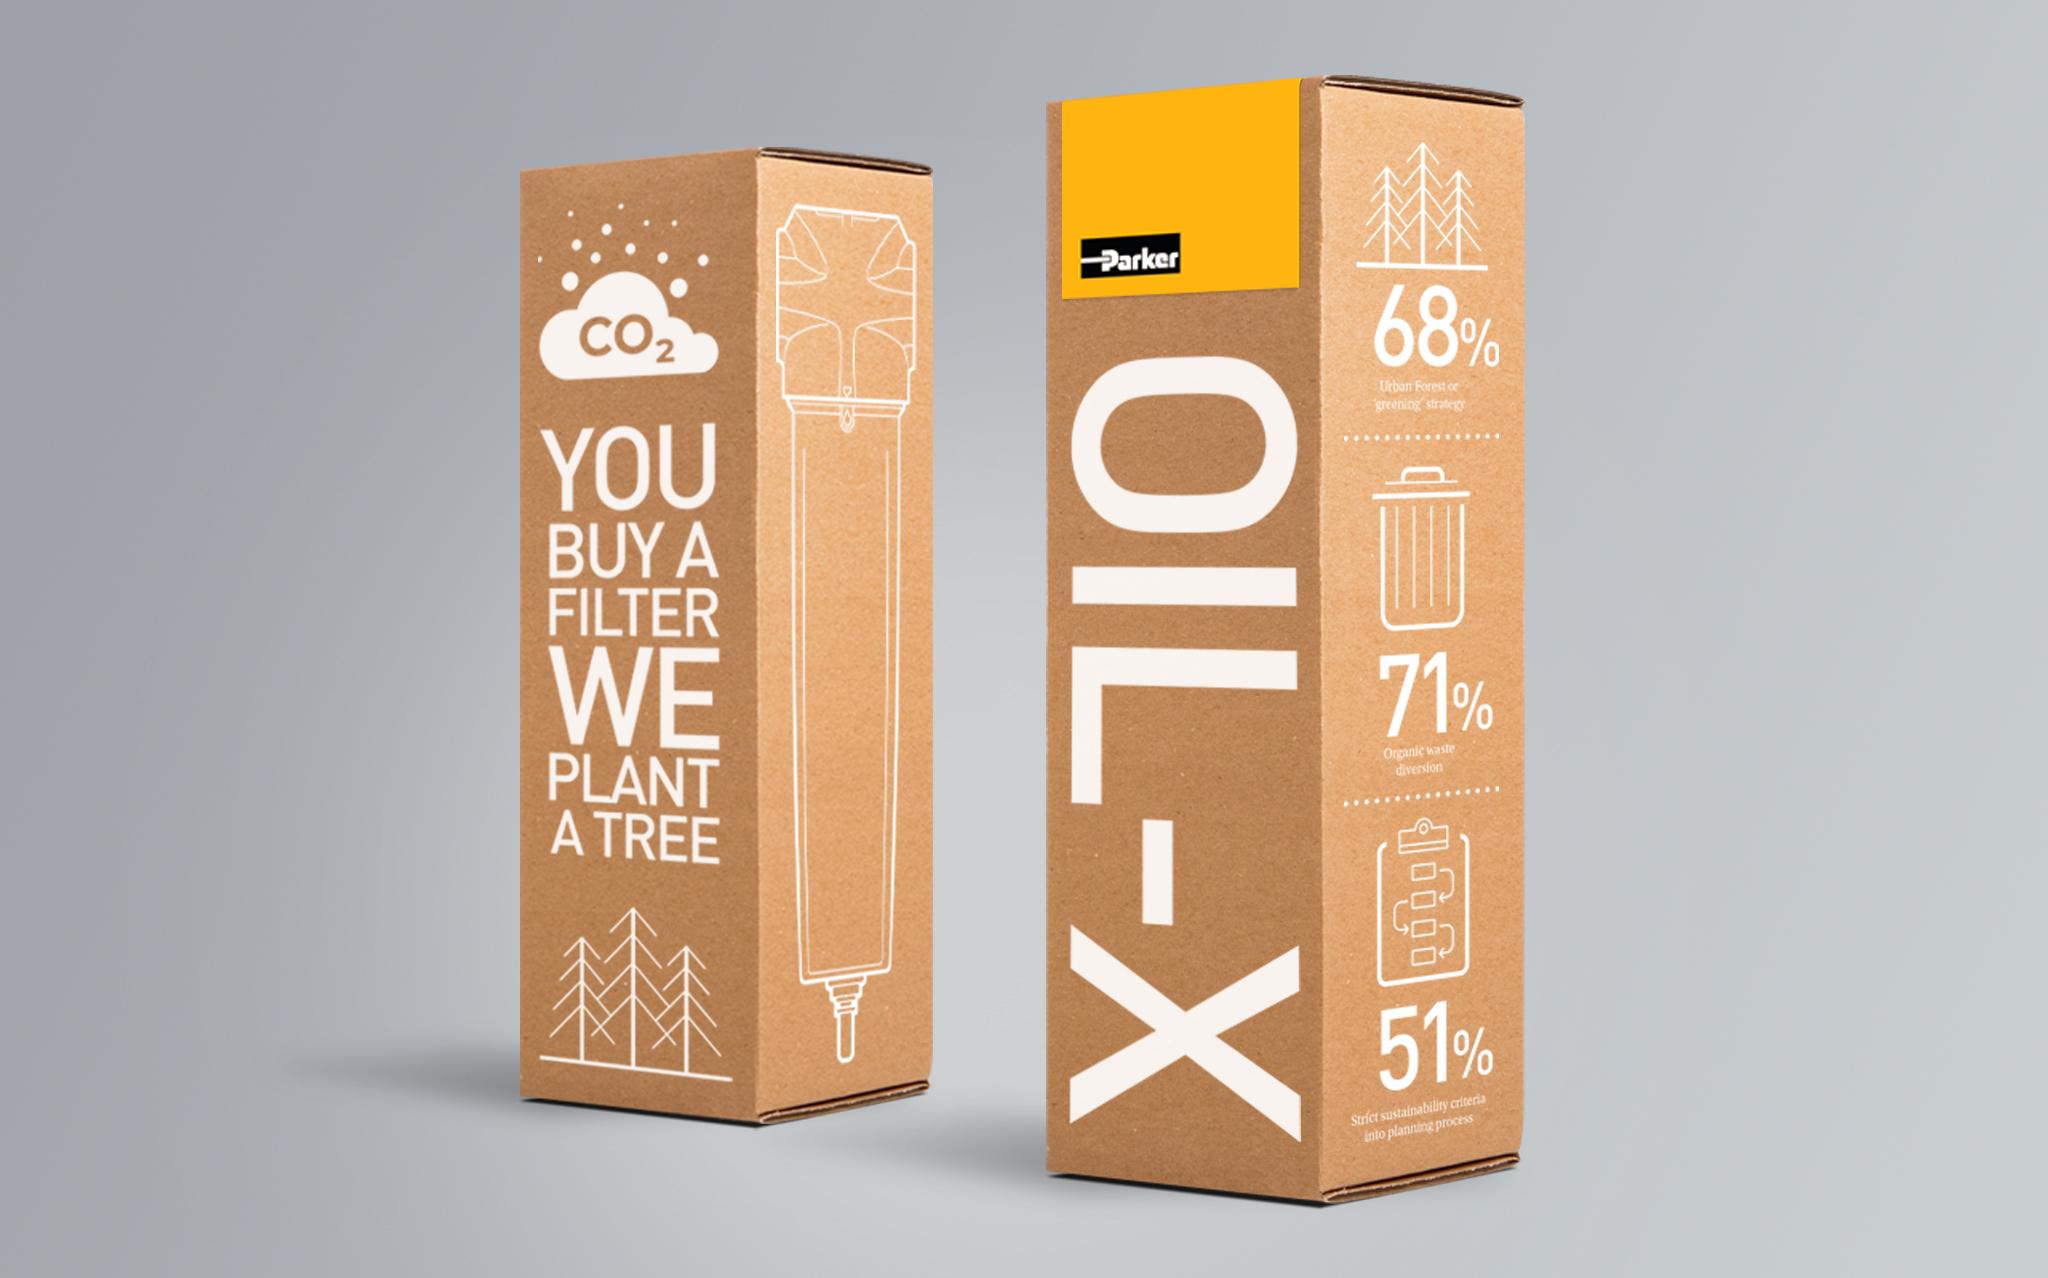 Parker OIL-X Packaging